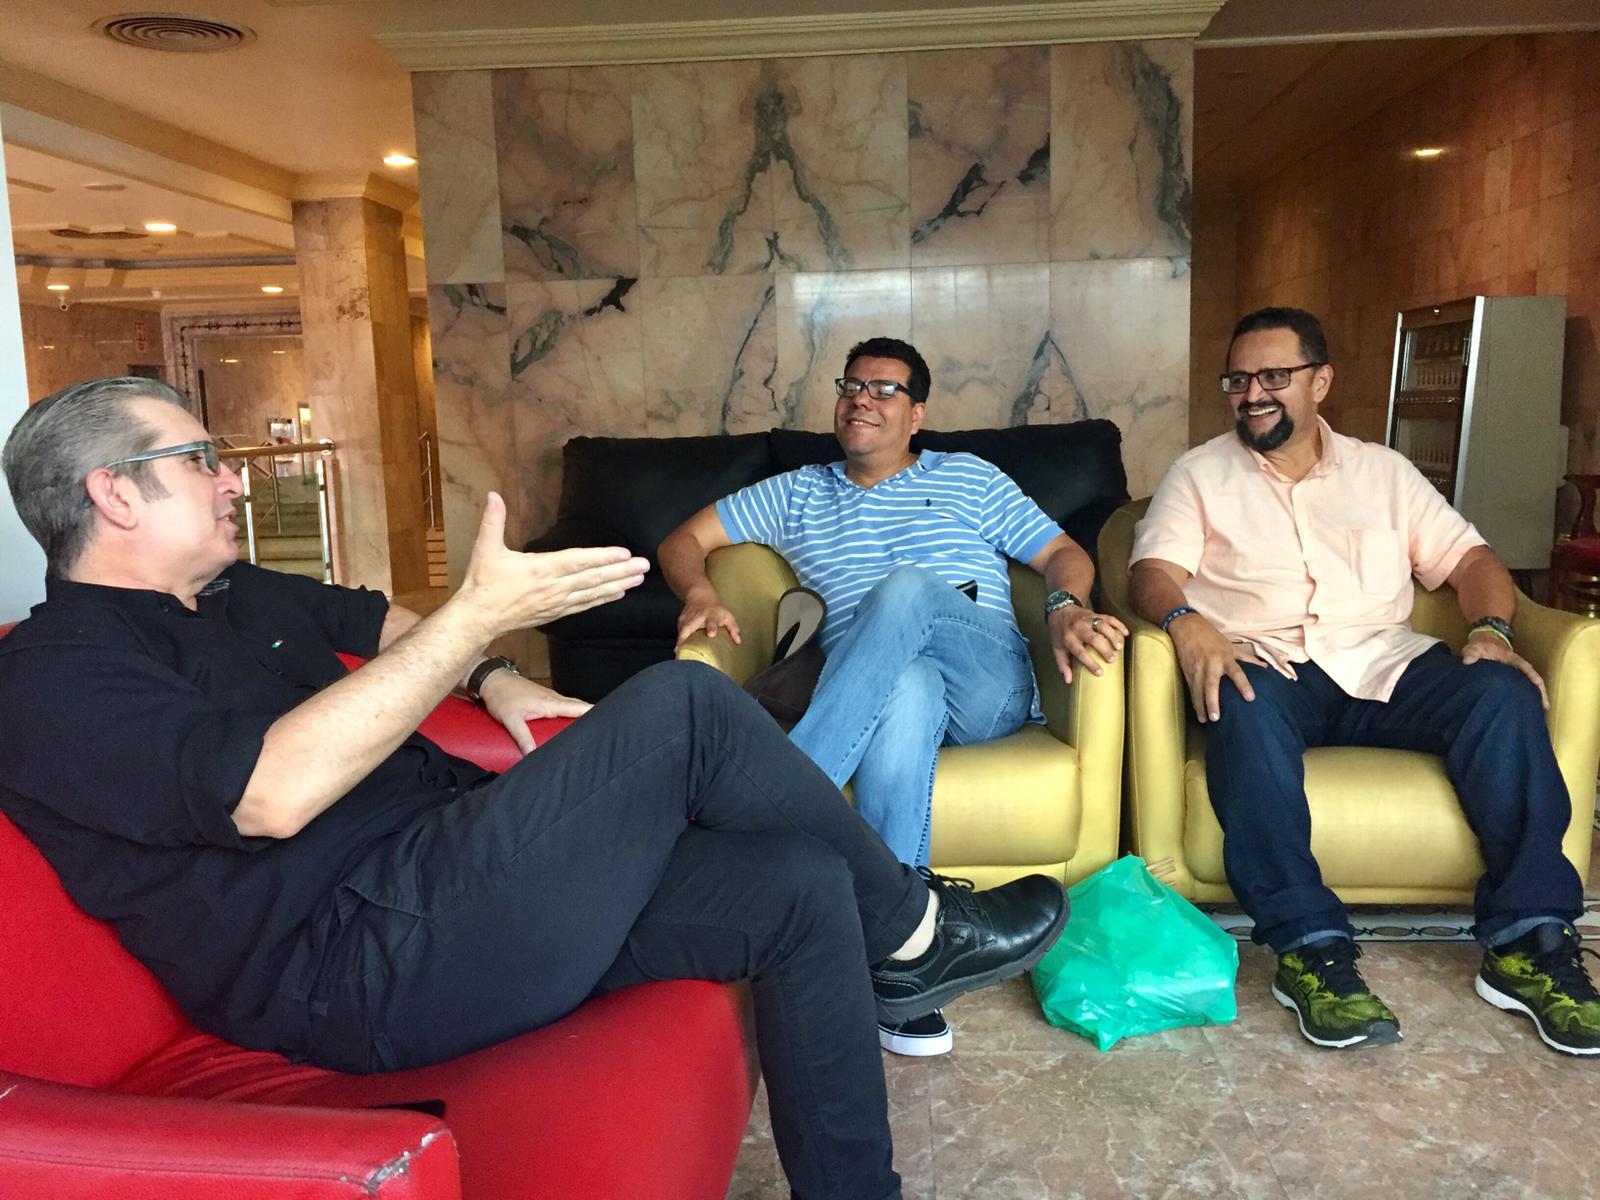 Juan meeting with pastor Francisco and D'Jard